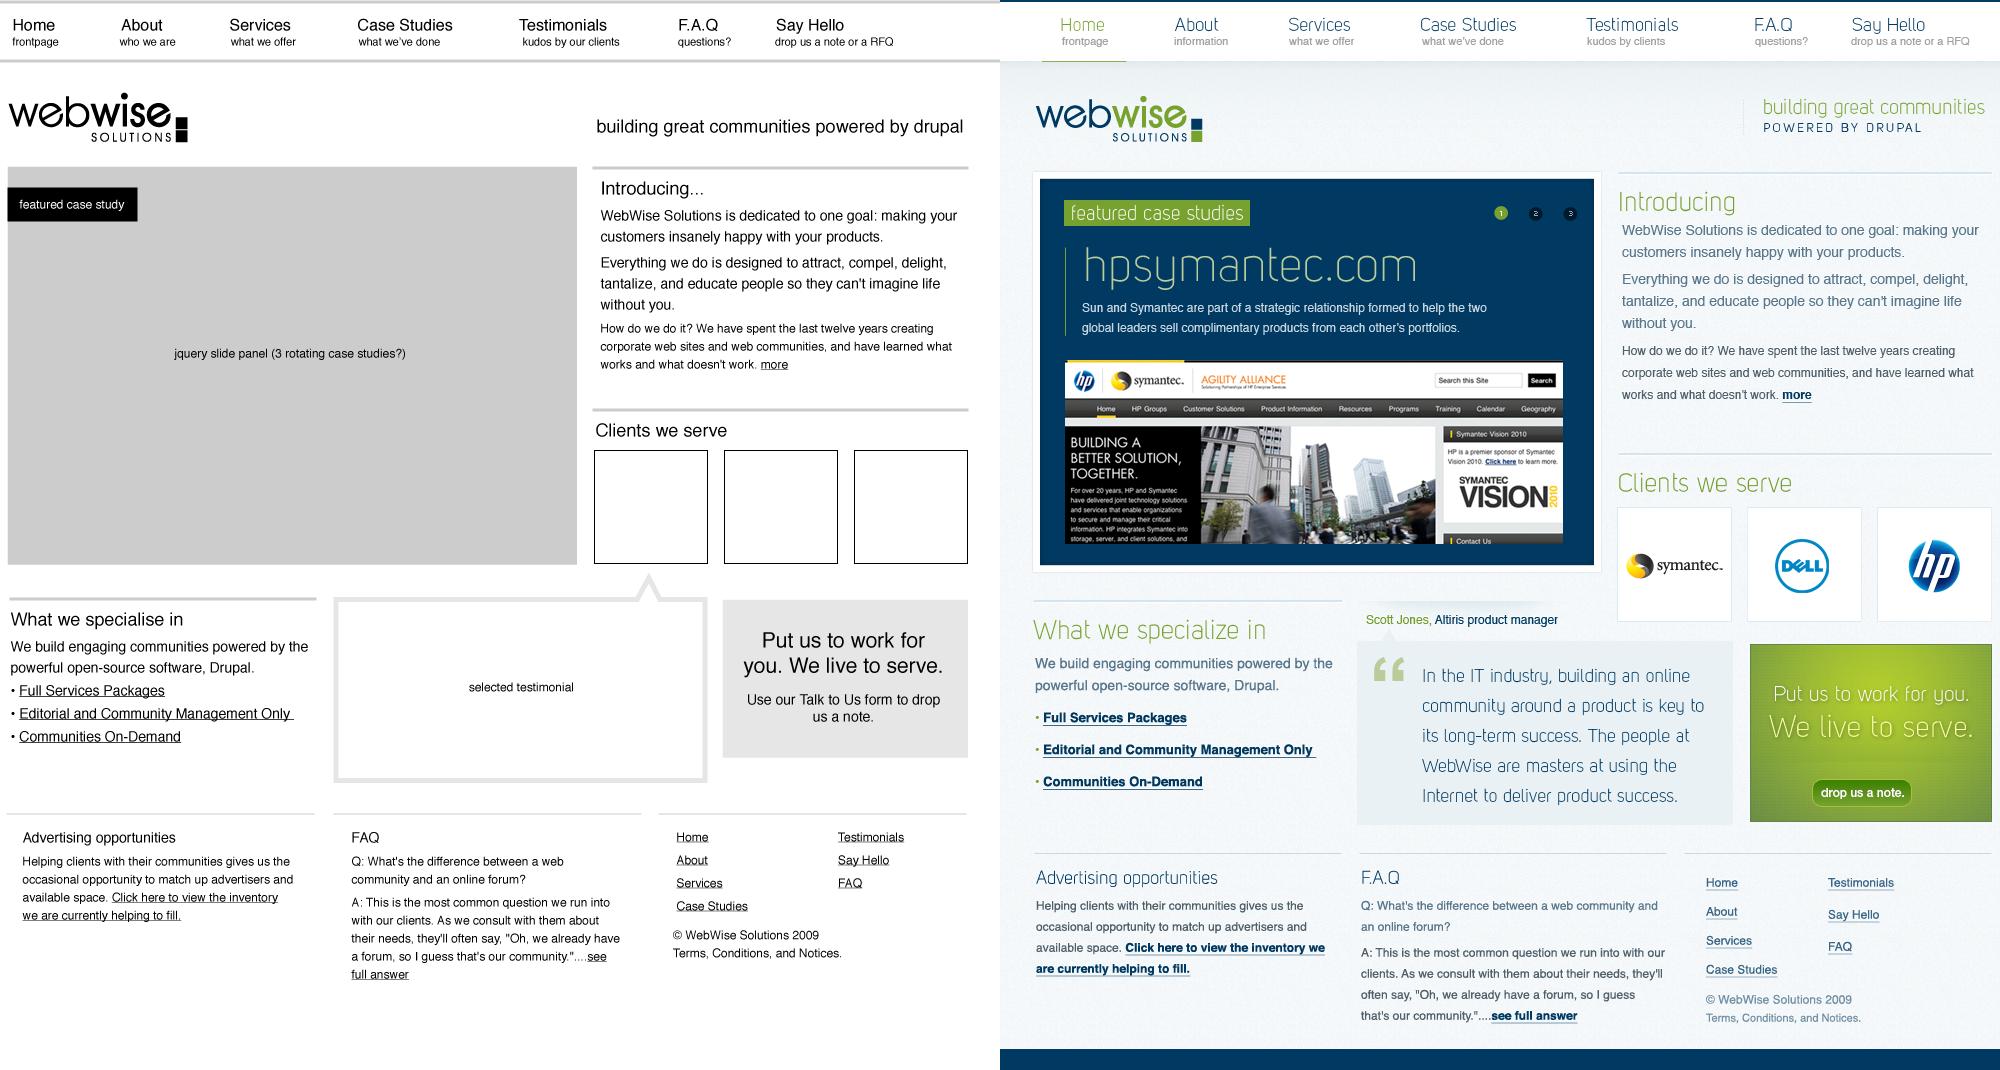 Webwise 2010